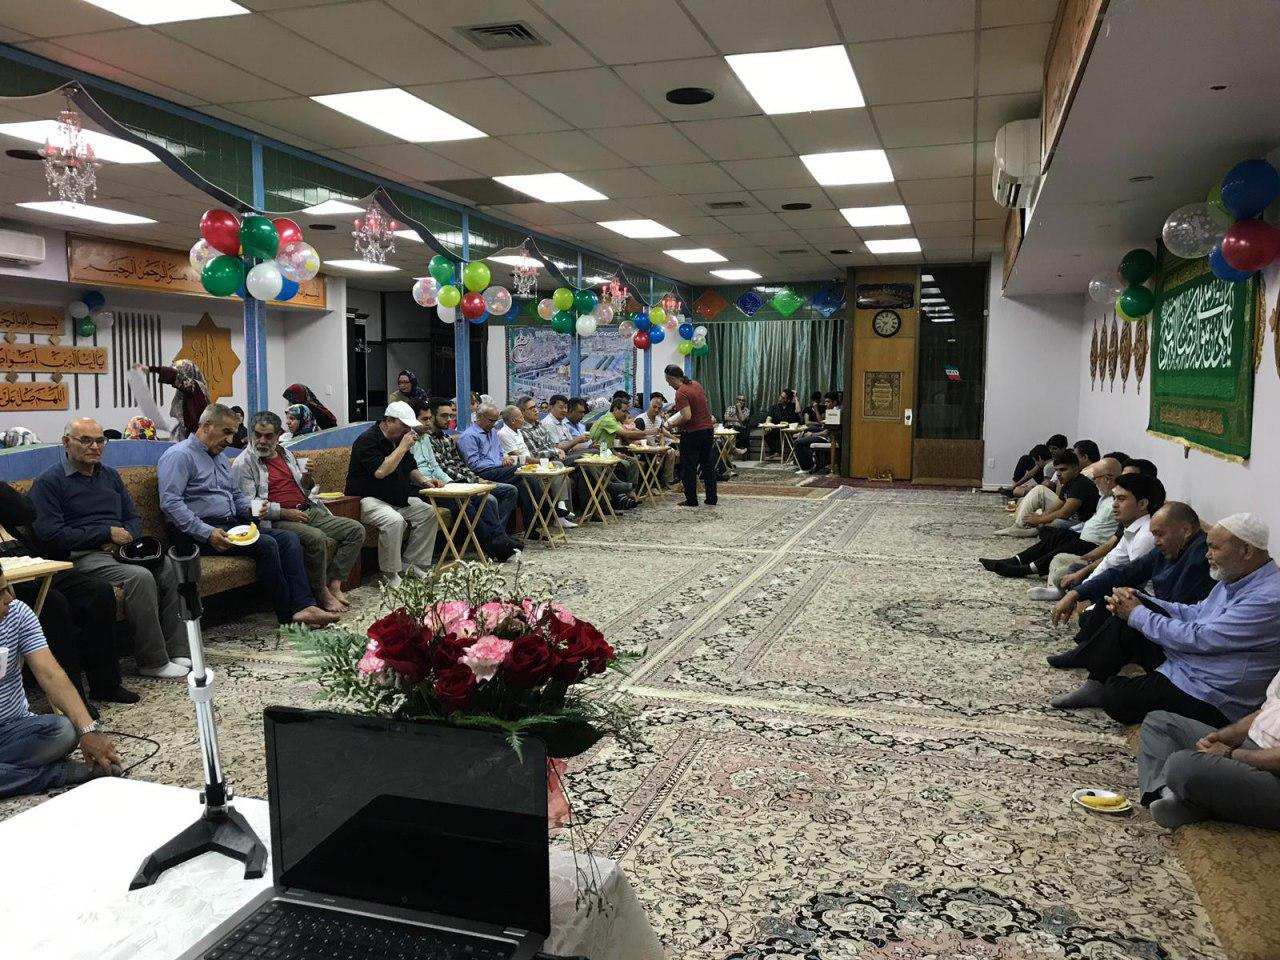 تصویر برگزاری جشن میلاد حضرت امام رضا علیه السلام در کانادا